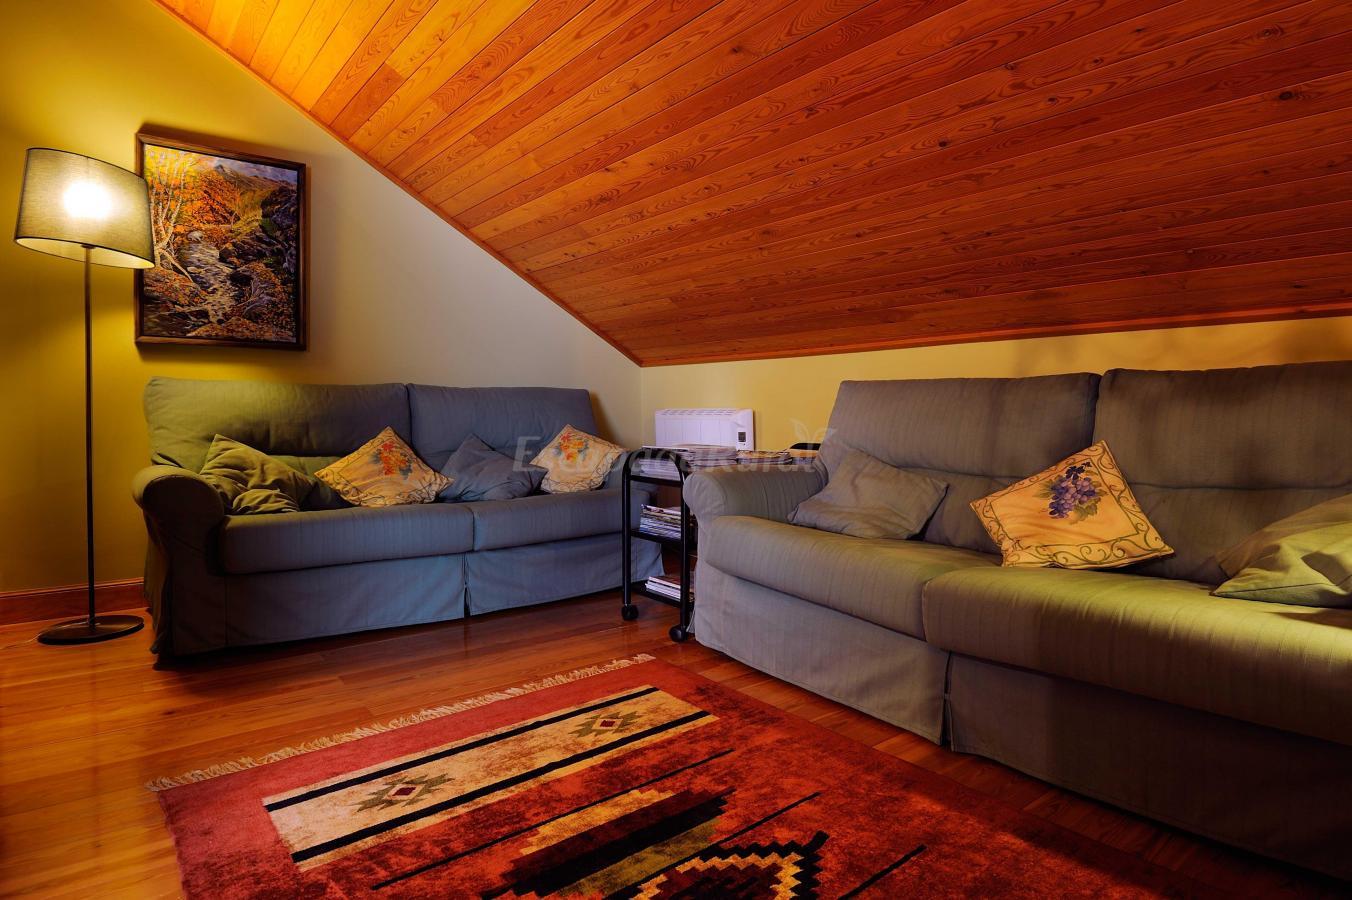 Fotos de la casa de madera casa rural en arrieta vizcaya for La casa de madera